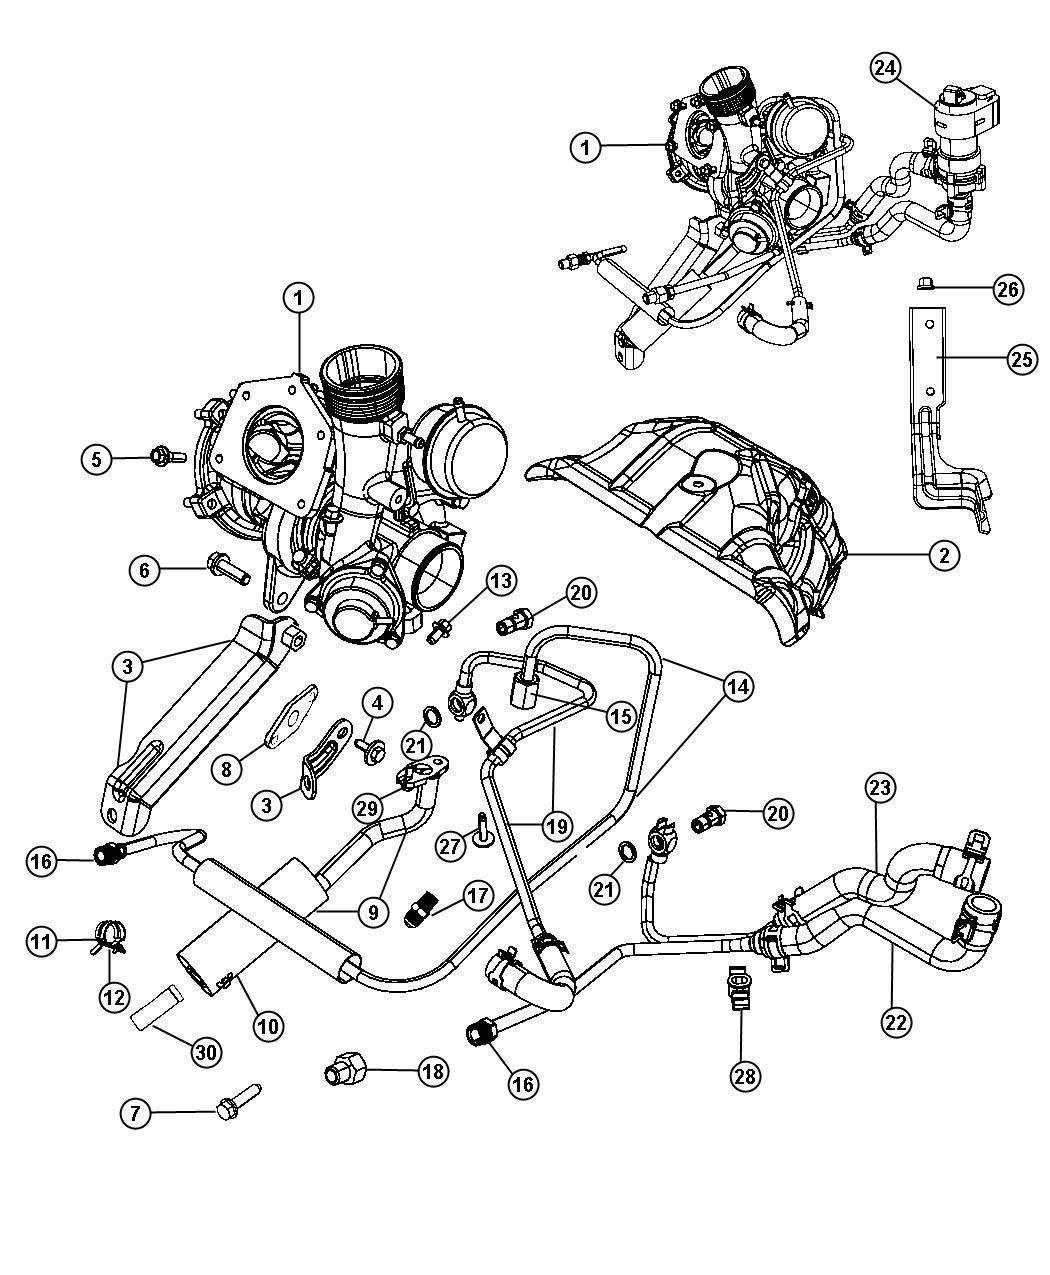 Dodge Caliber SRT4, 2.4L 4 Cyl DOHC 16V Turbo, 6-Speed